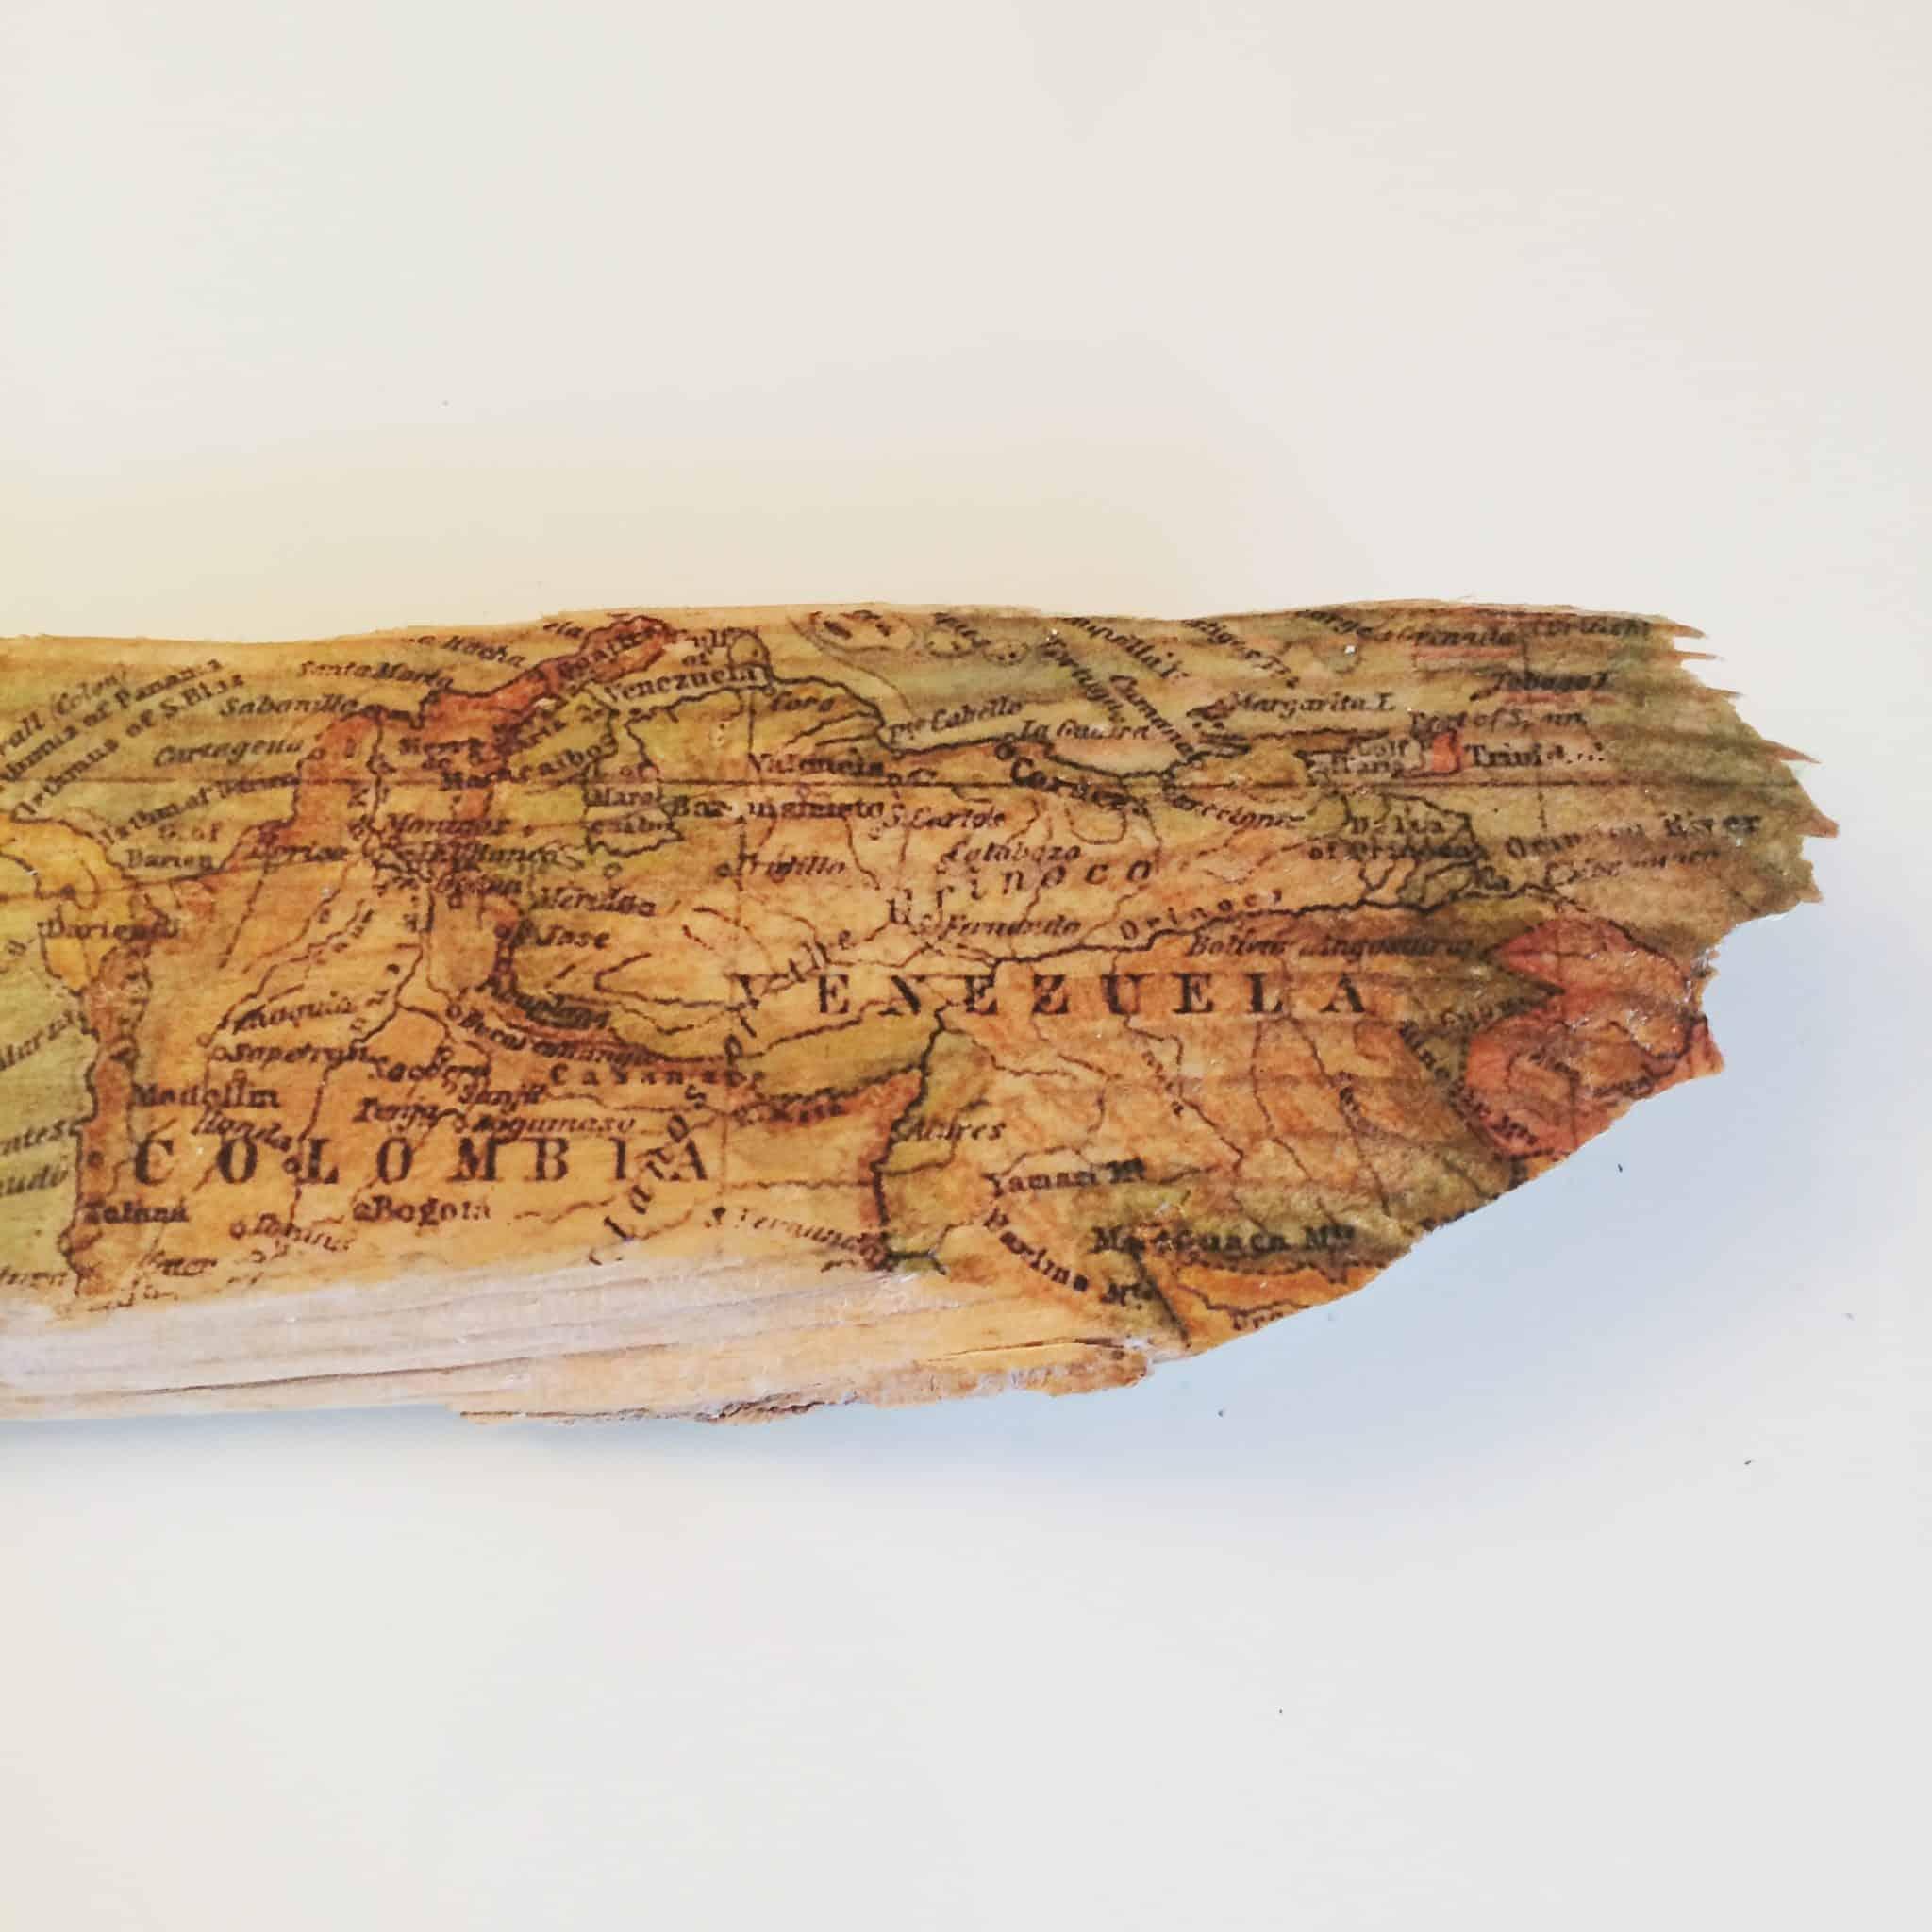 DIY riciclo di vecchie tavole in legno. Blog Vintage